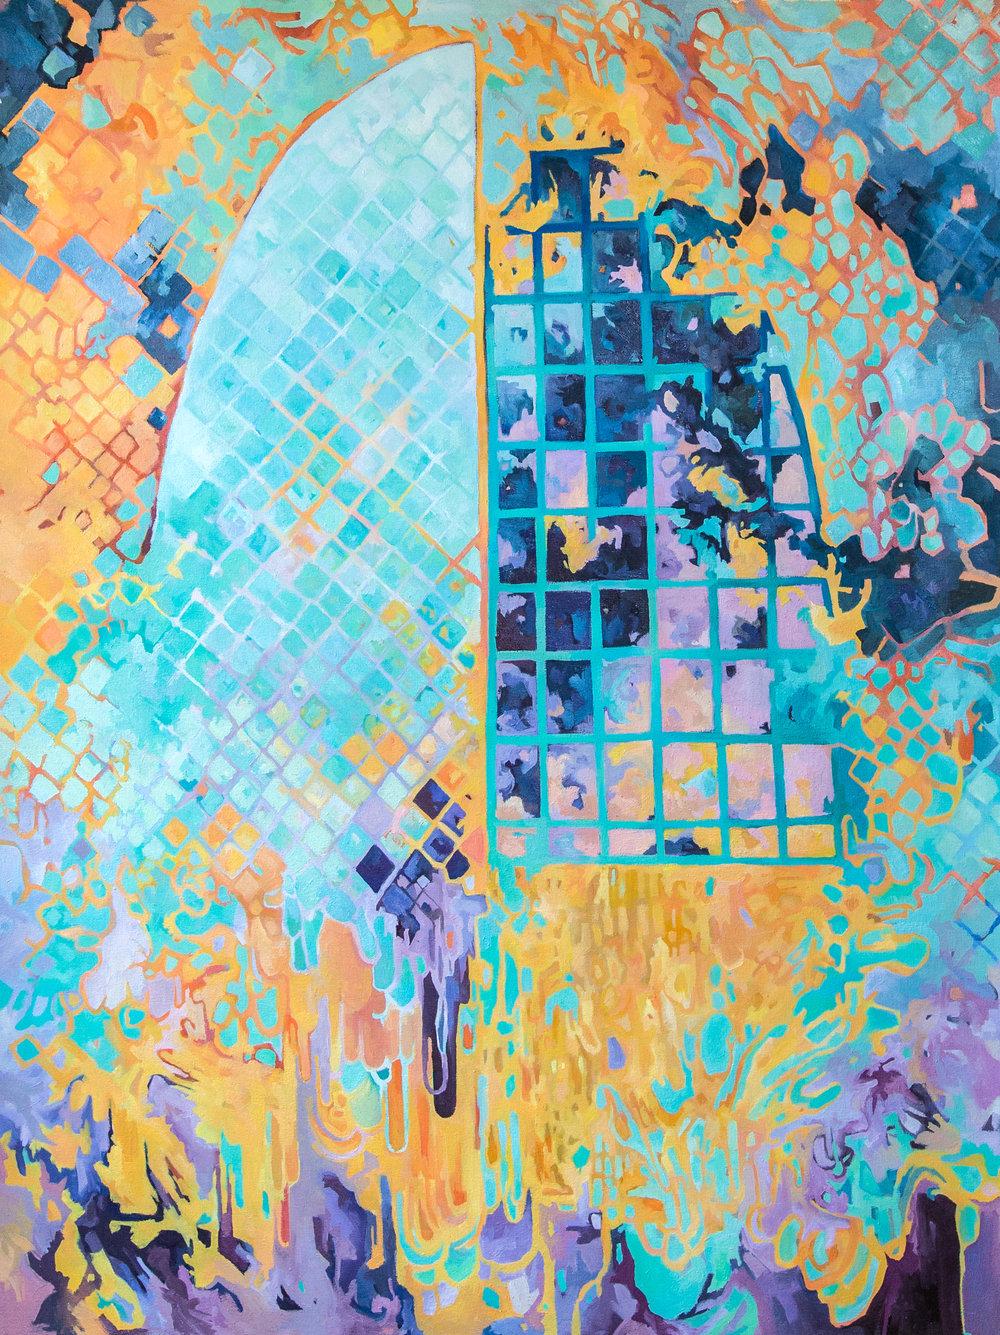 Through a High Window, 2018, oil on canvas, 47 x 36 inches